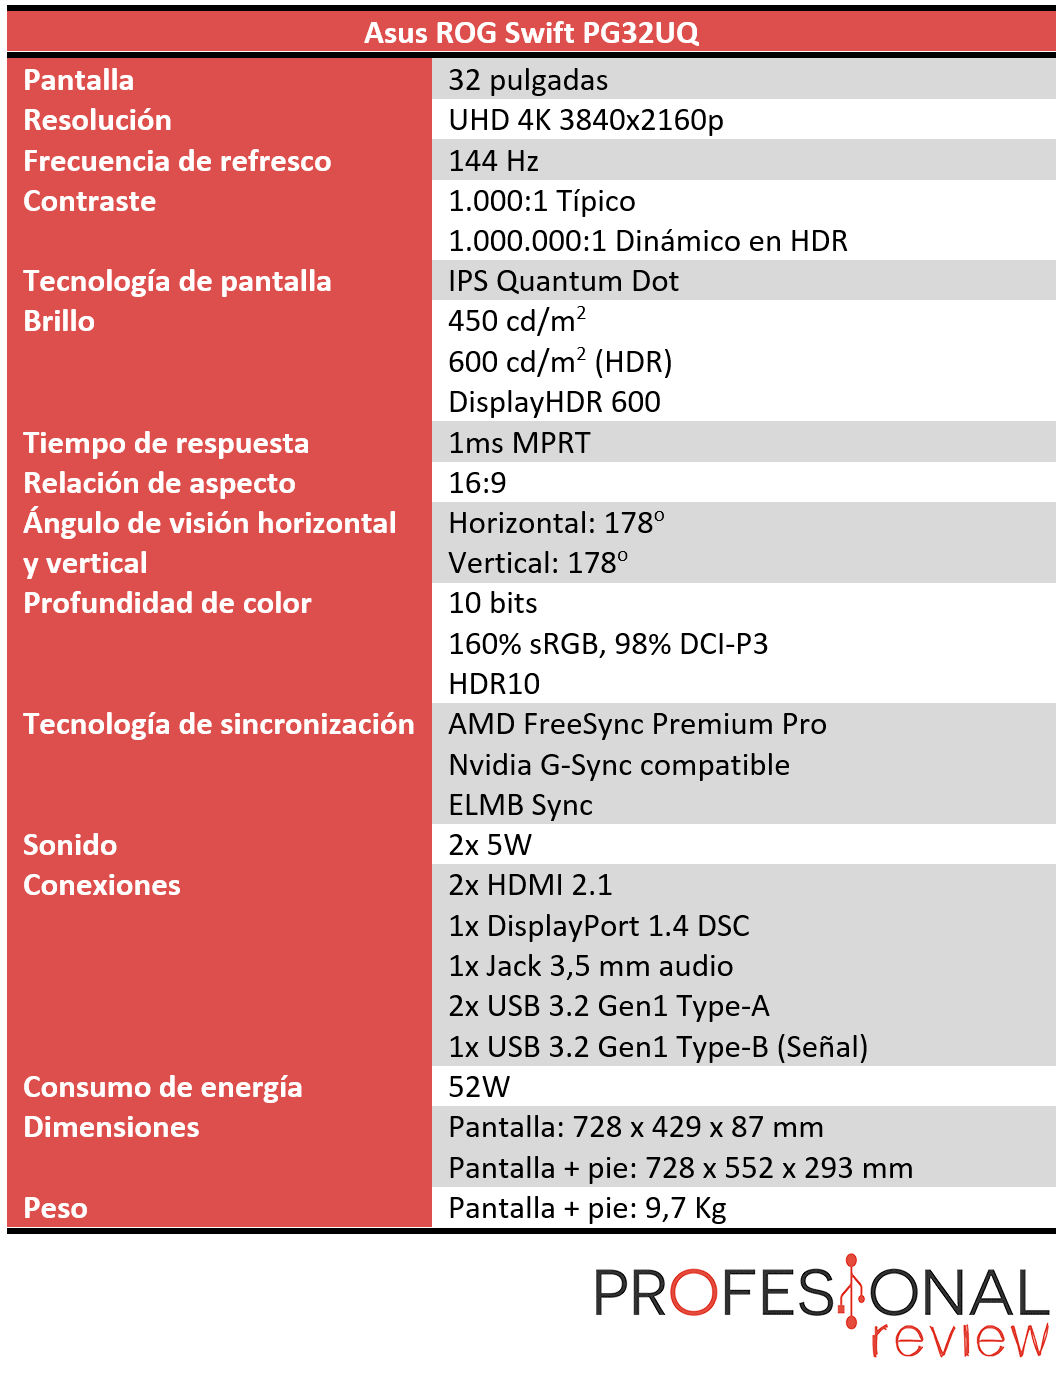 Asus ROG Swift PG32UQ Características